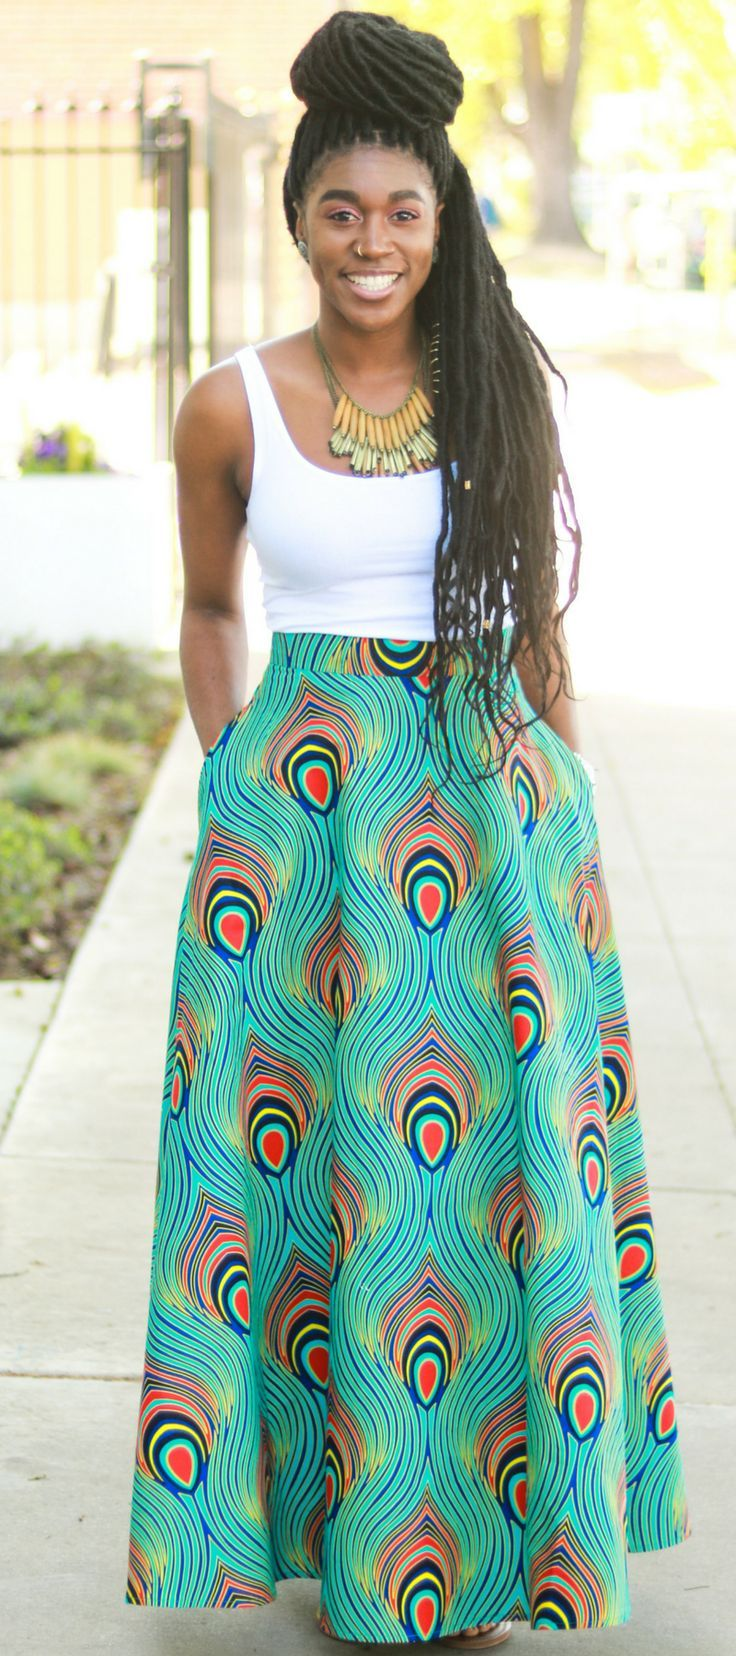 African Skirts Patterns : african, skirts, patterns, Circle, Skirt, Pockets, Tutorial, Montoya, African, Print, Skirt,, Skirts